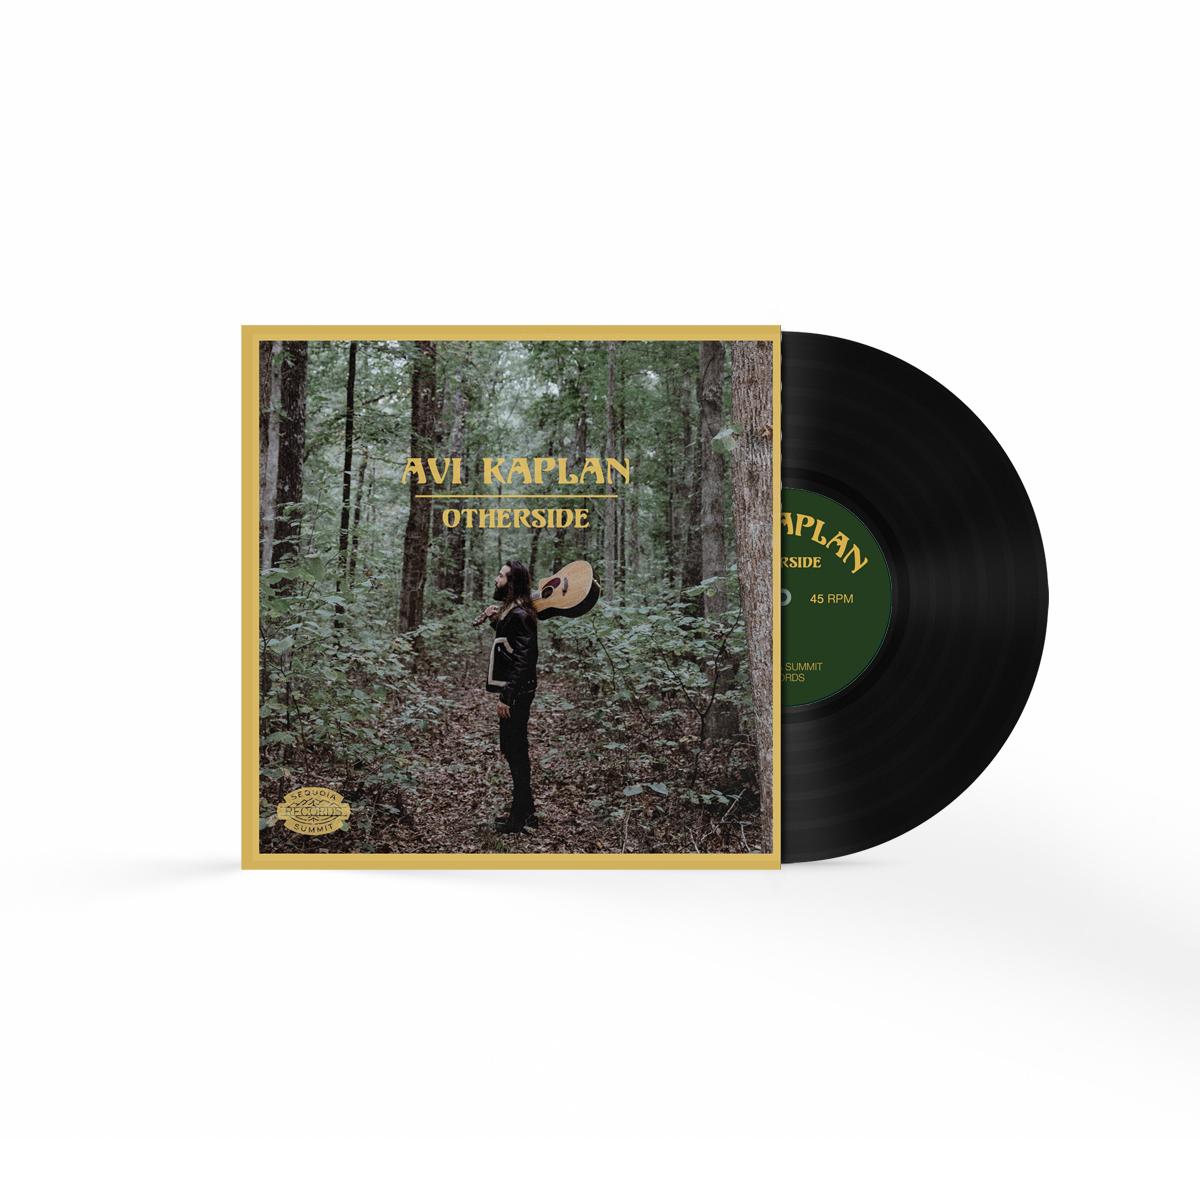 "Change on the Rise / Otherside 7"" Vinyl"